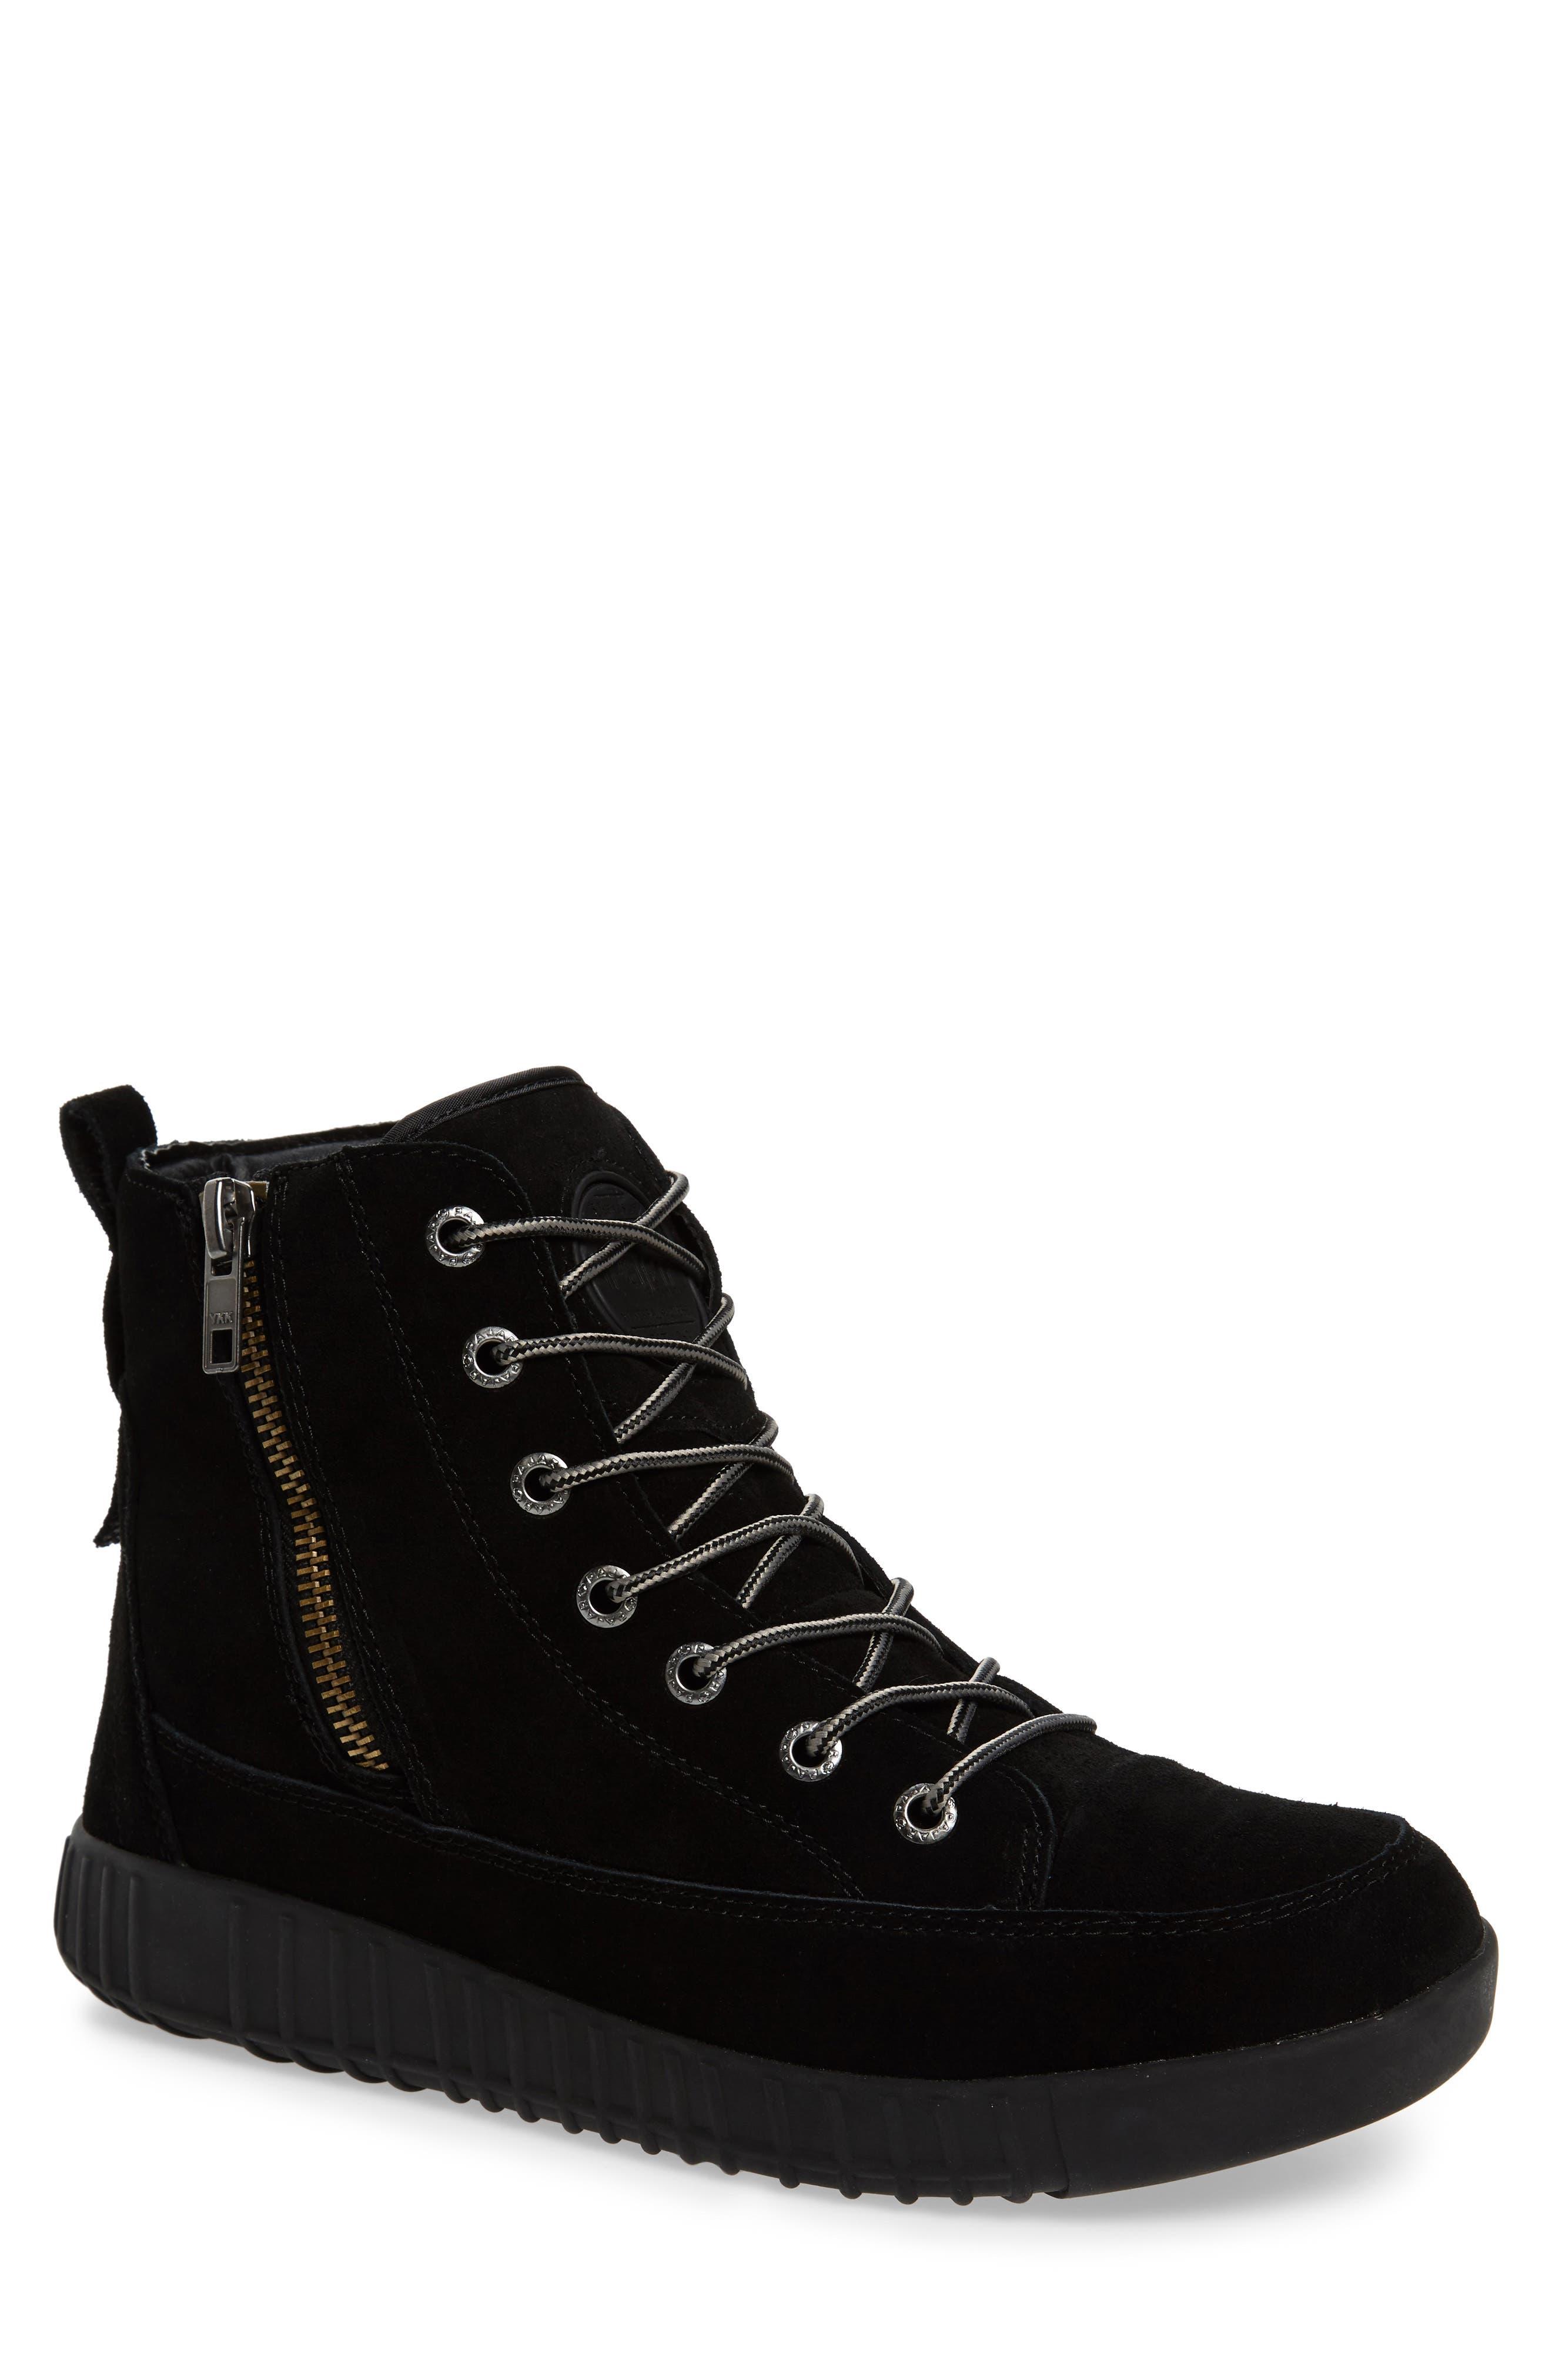 PAJAR Parnell Waterproof Winter Sneaker, Main, color, 001